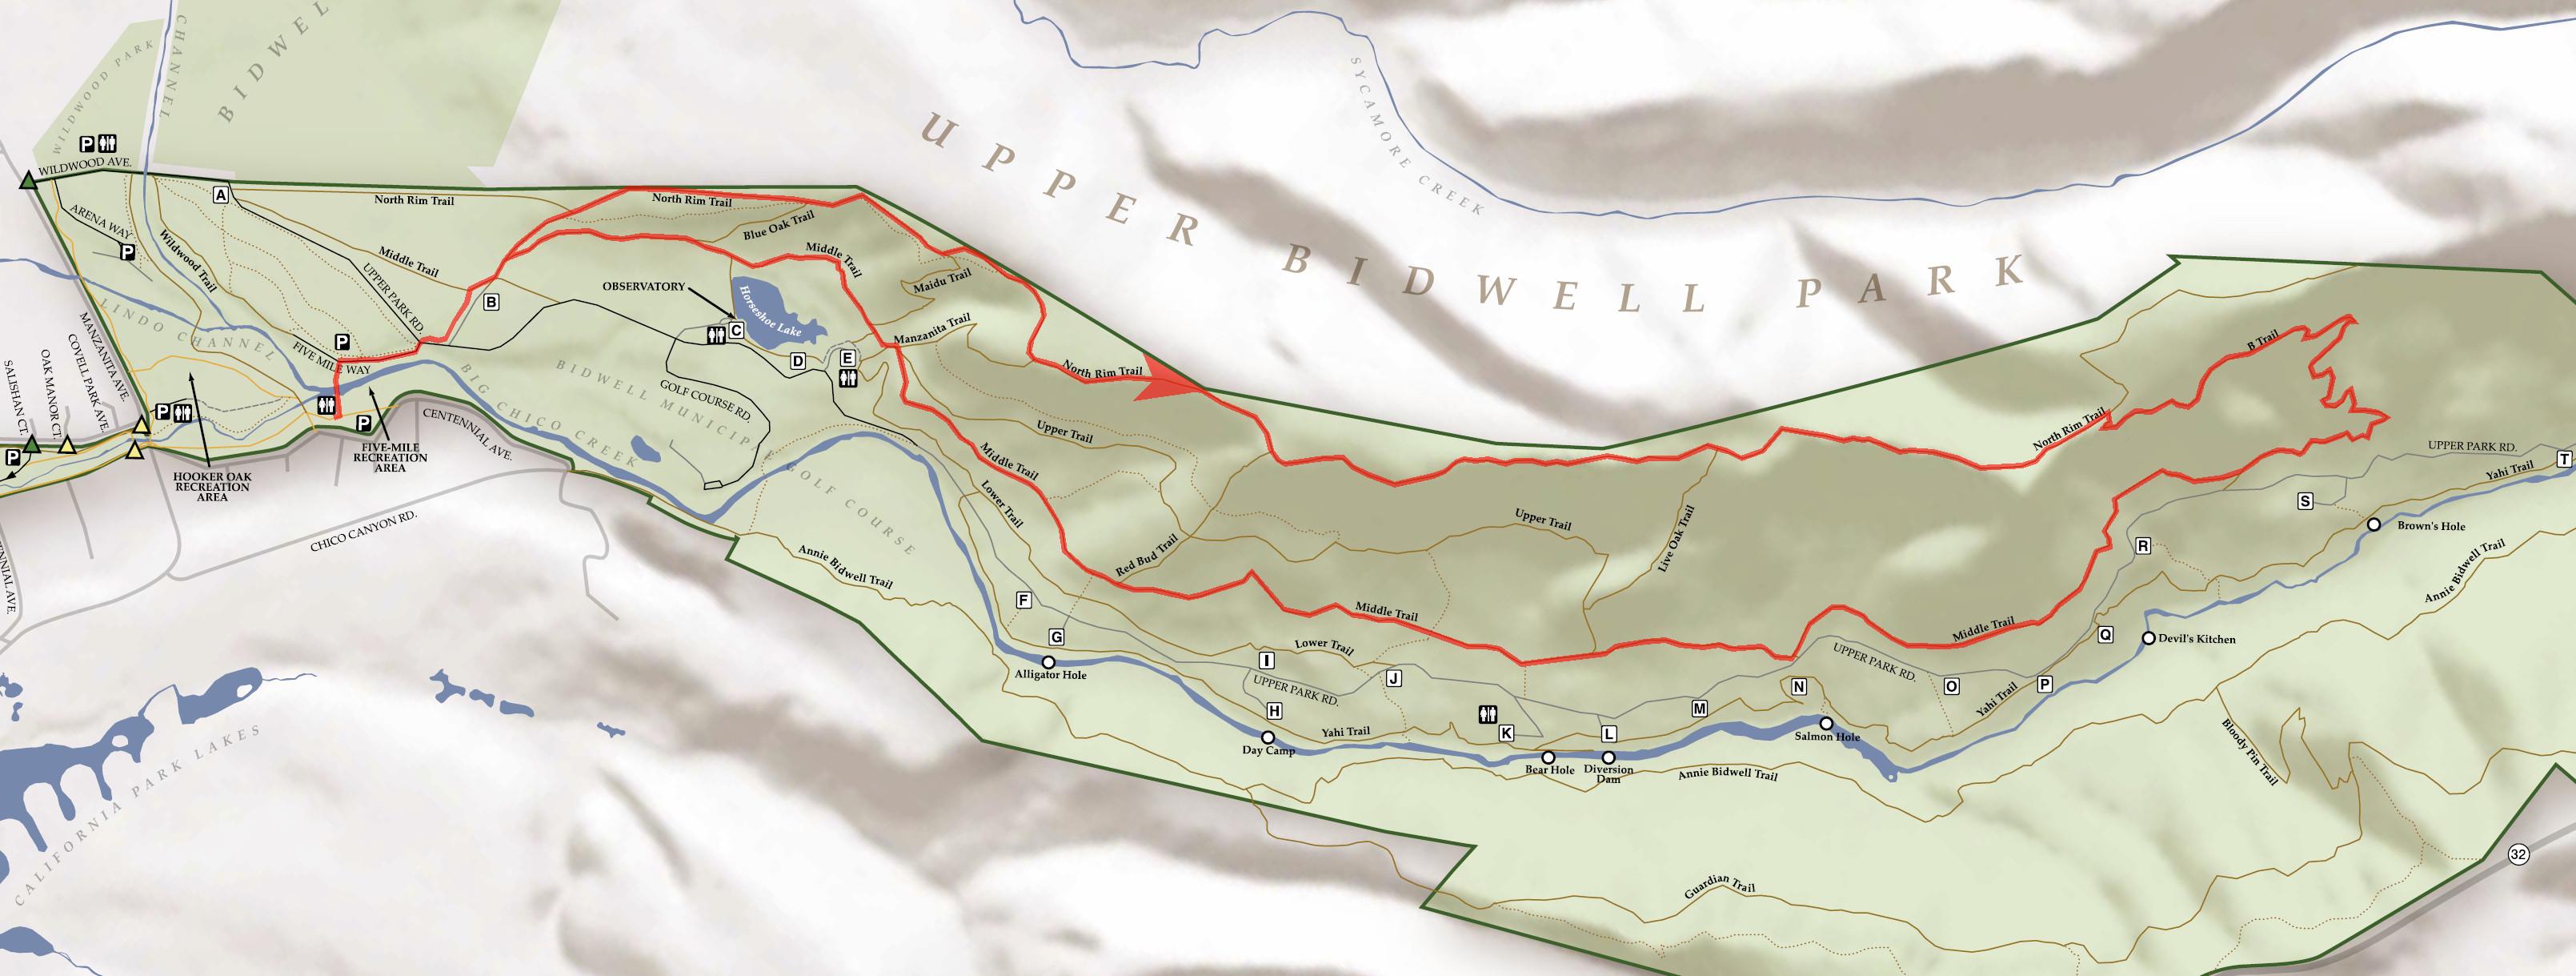 Bidwell Park Bay Area Mountain Bike Rides